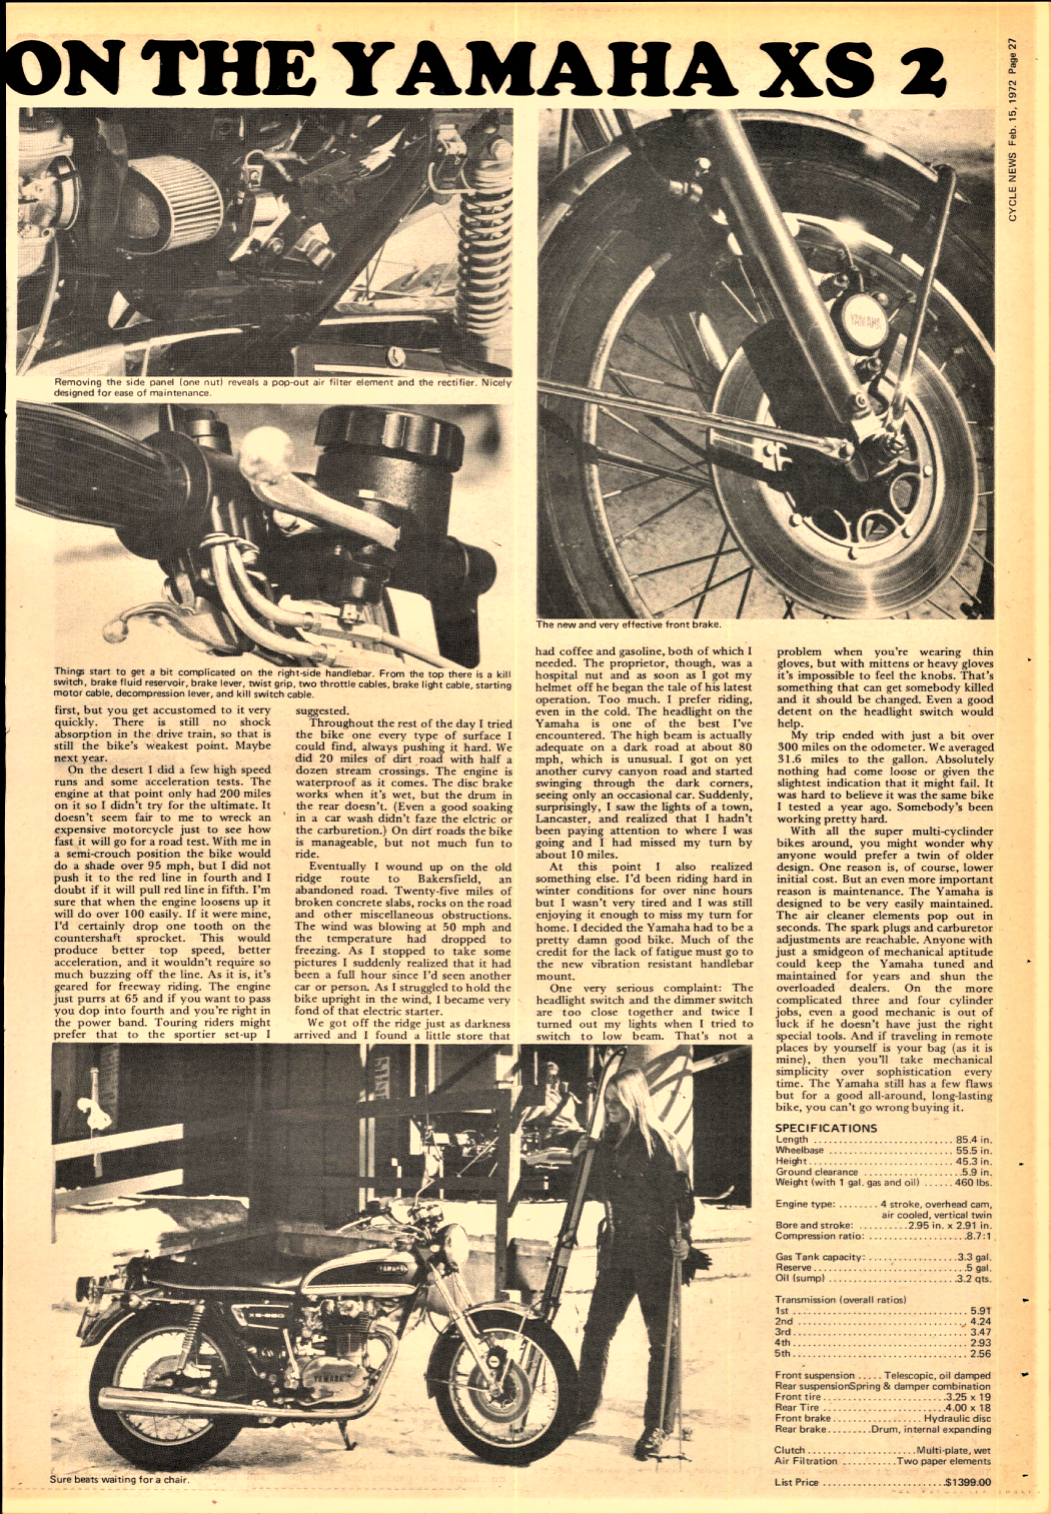 1972 Yamaha XS-2 road test.2.jpg